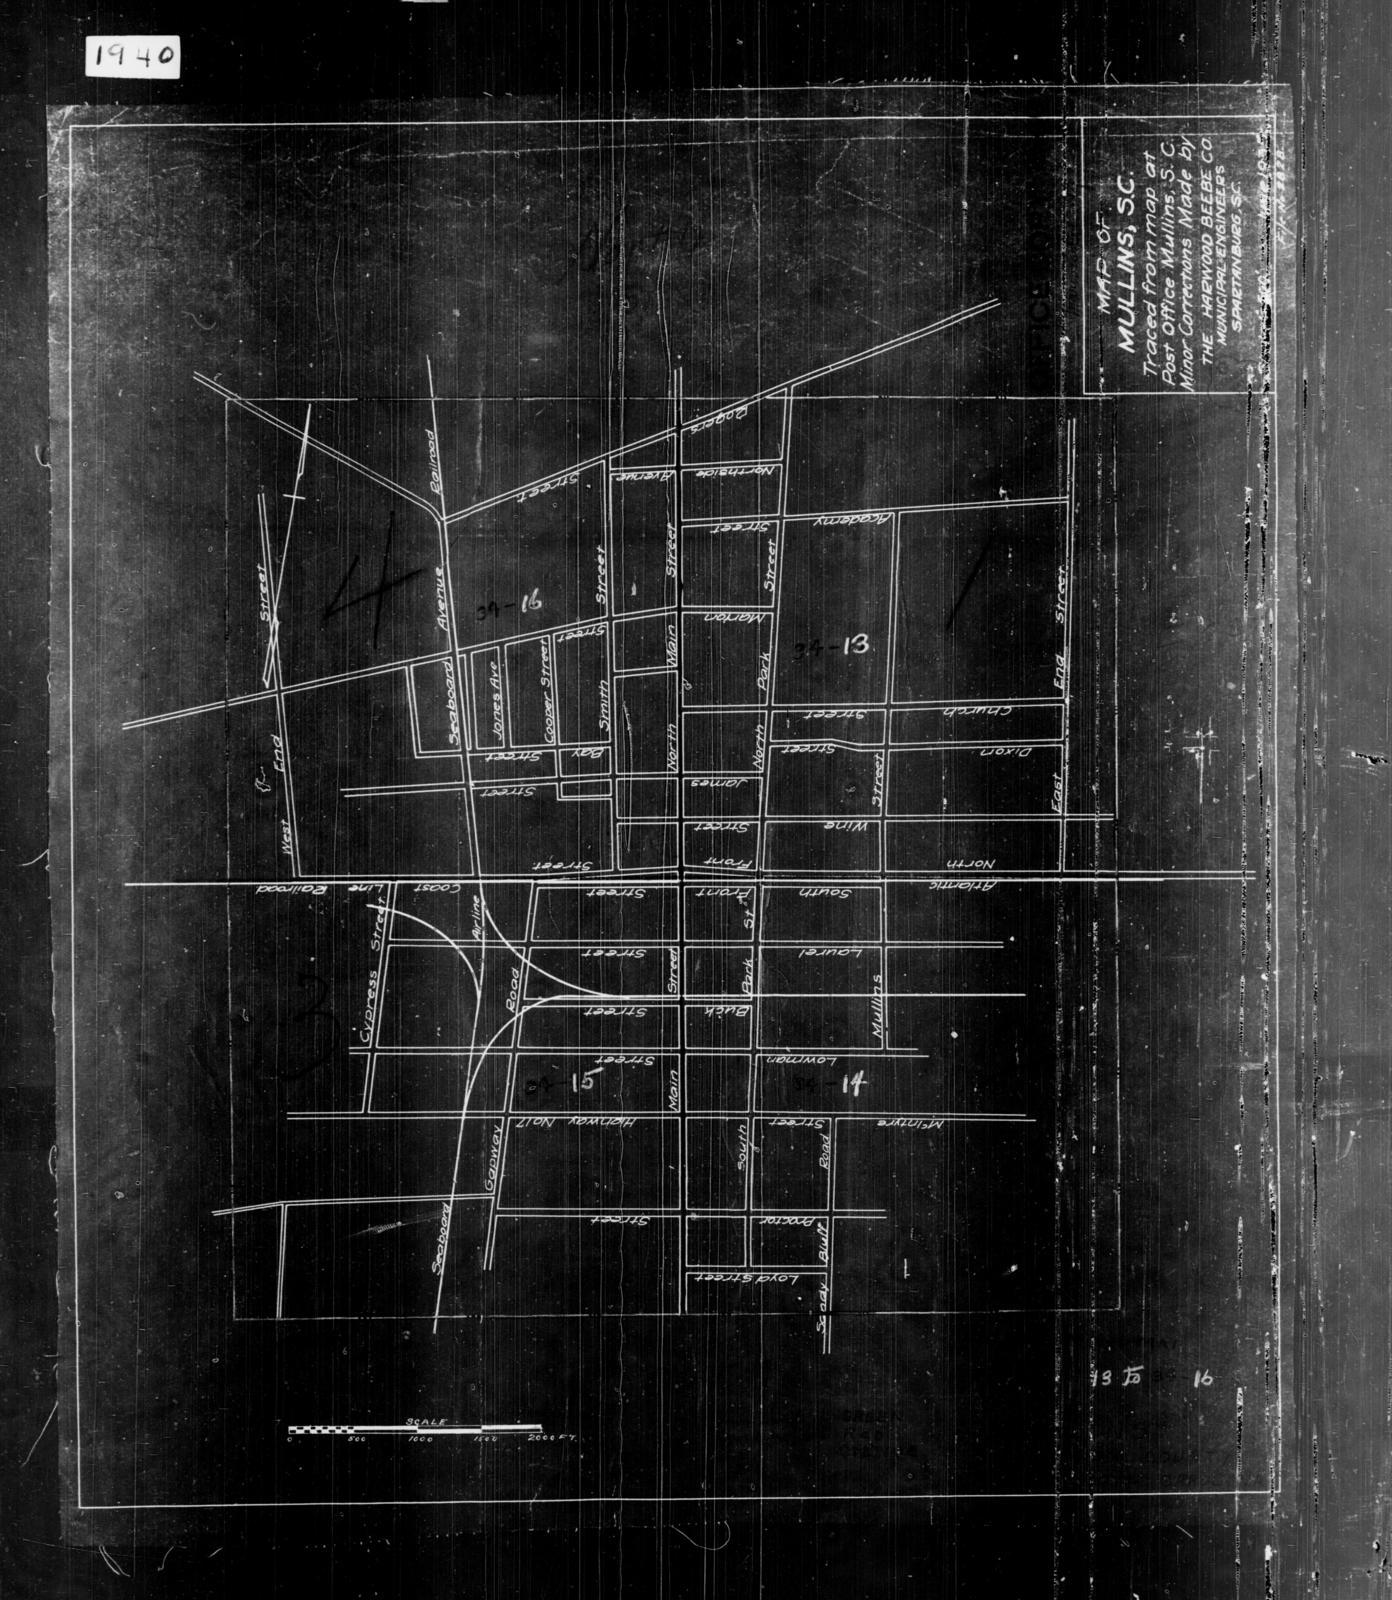 1940 Census Enumeration District Maps - South Carolina - Marion County - Mullins - ED 34-13, ED 34-14, ED 34-15, ED 34-16